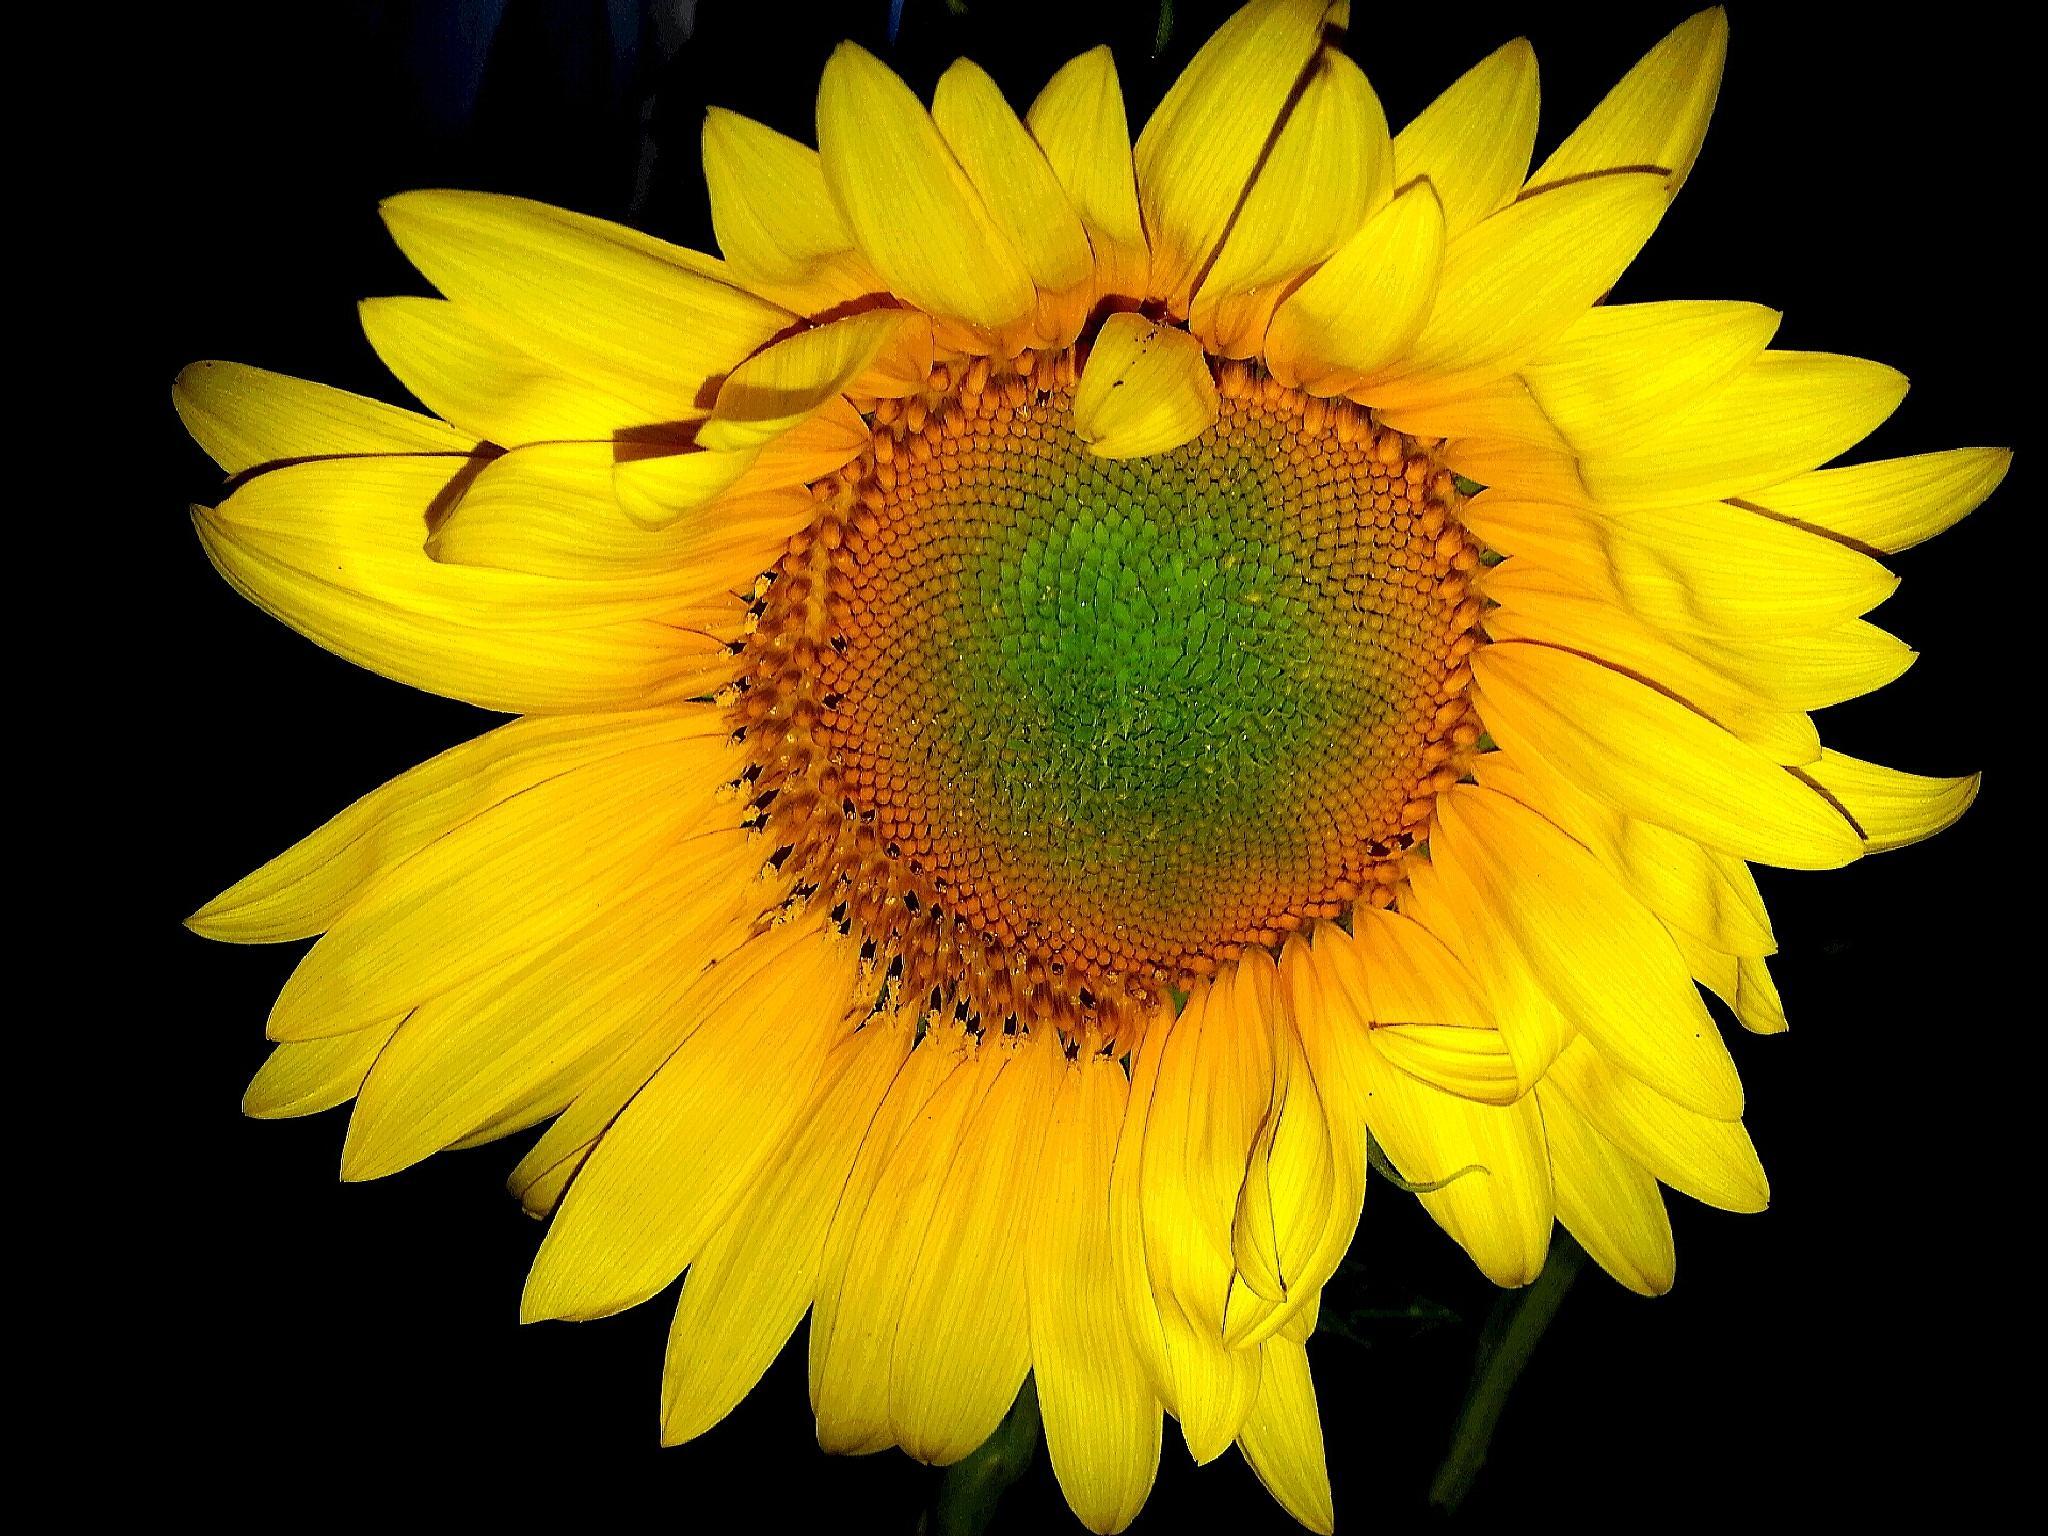 Sunflower in the dark by Cristiana